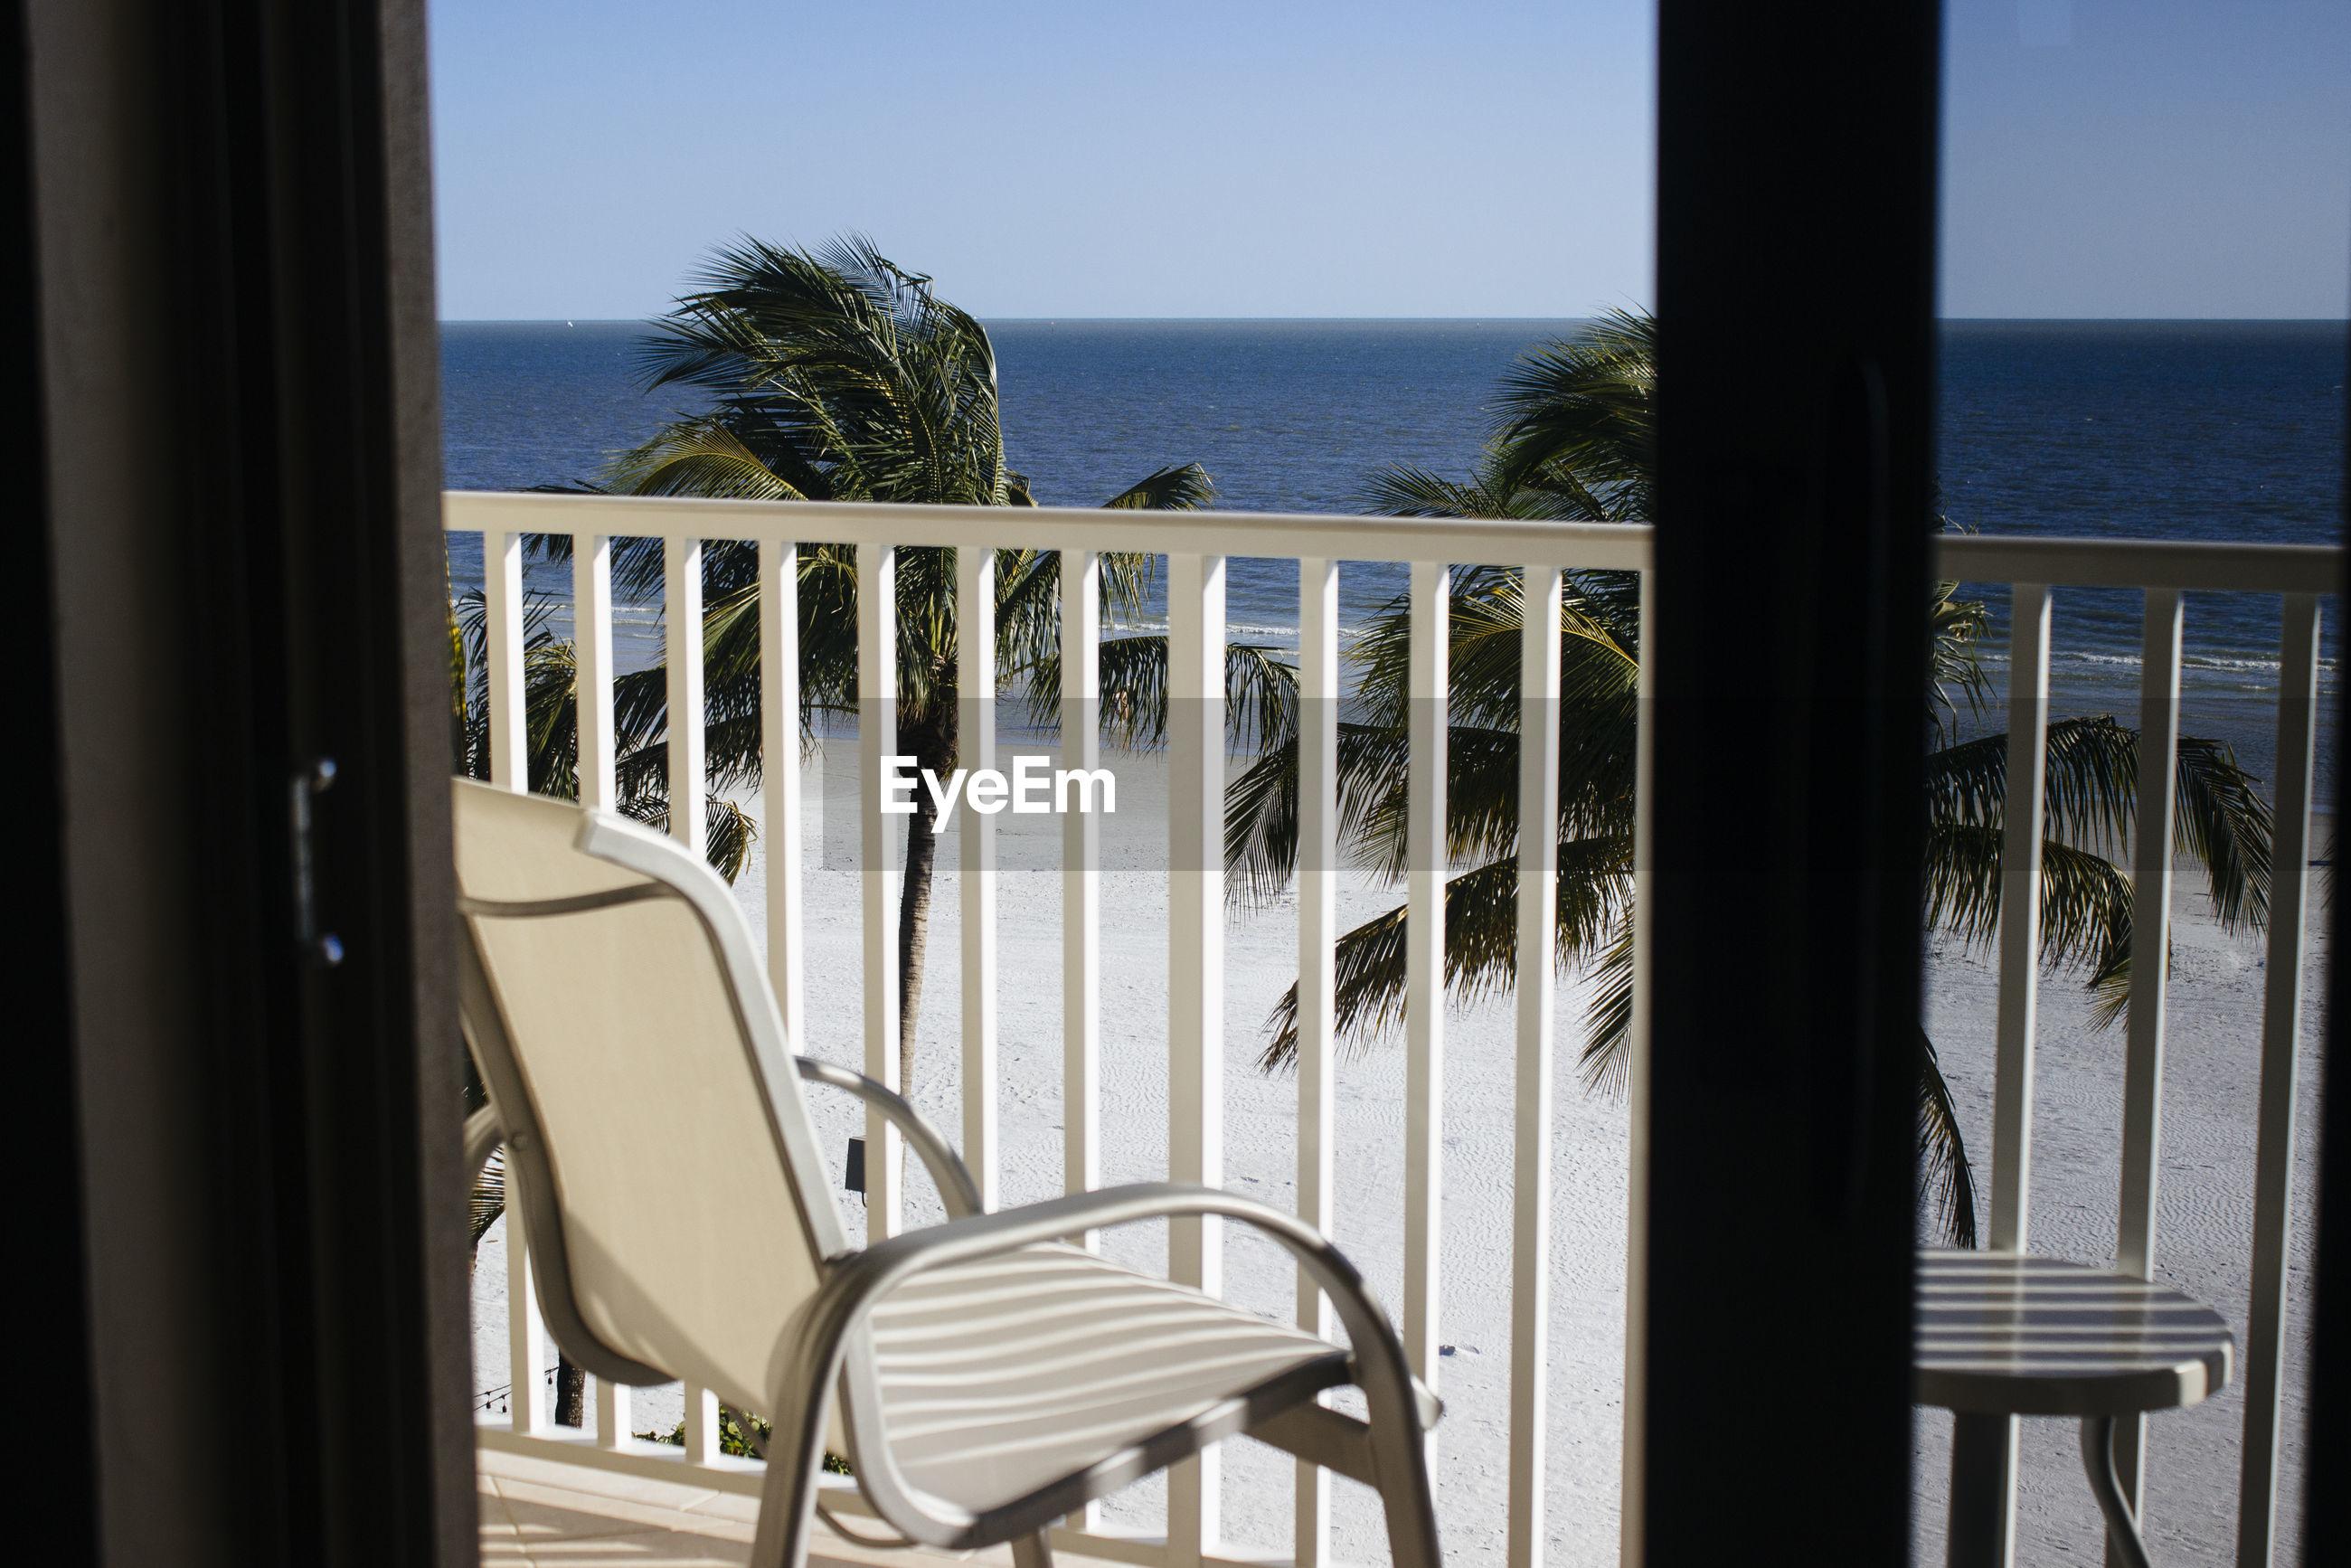 Empty chair on balcony by sea against sky